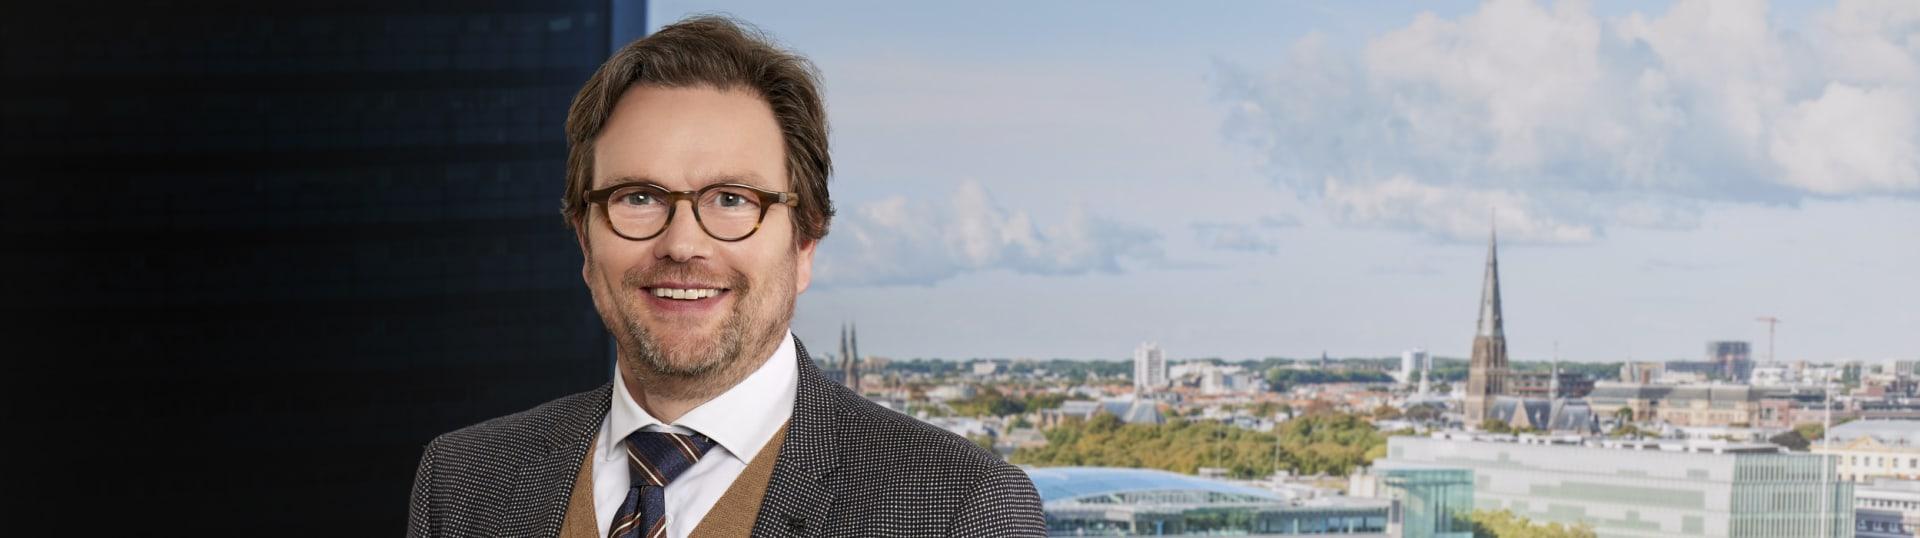 Niels Groenhart